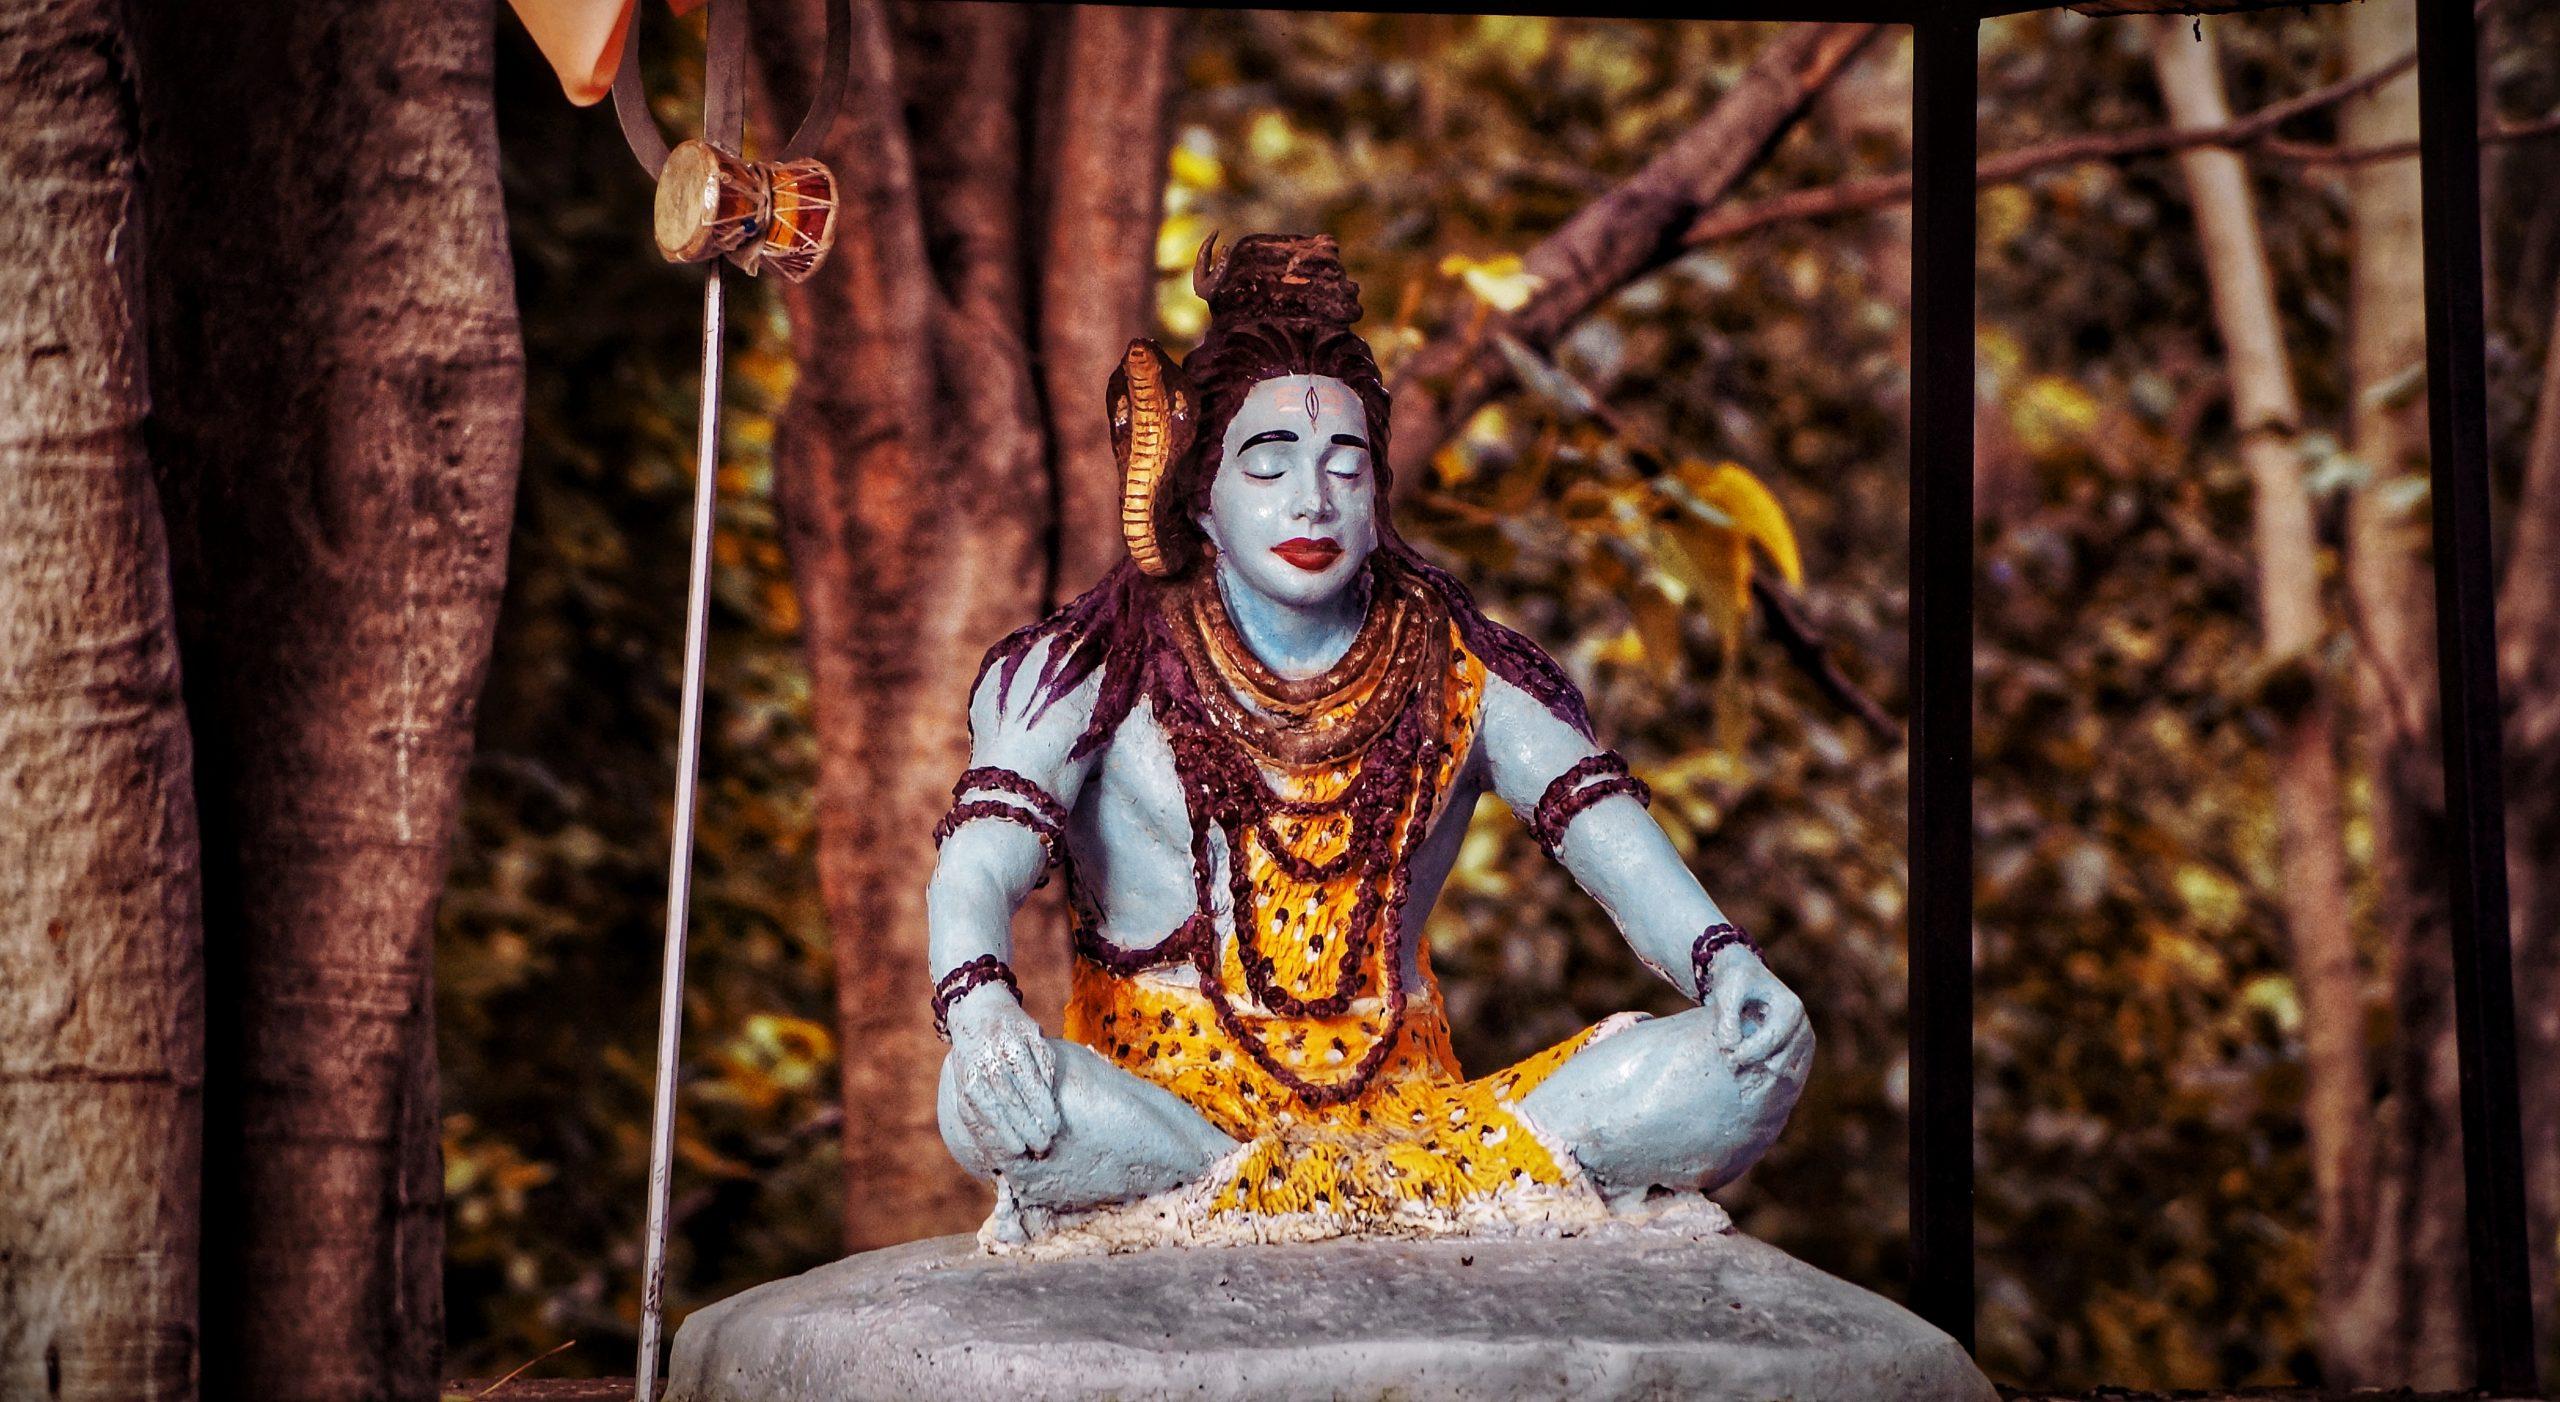 Lord Shiva statue on Focus